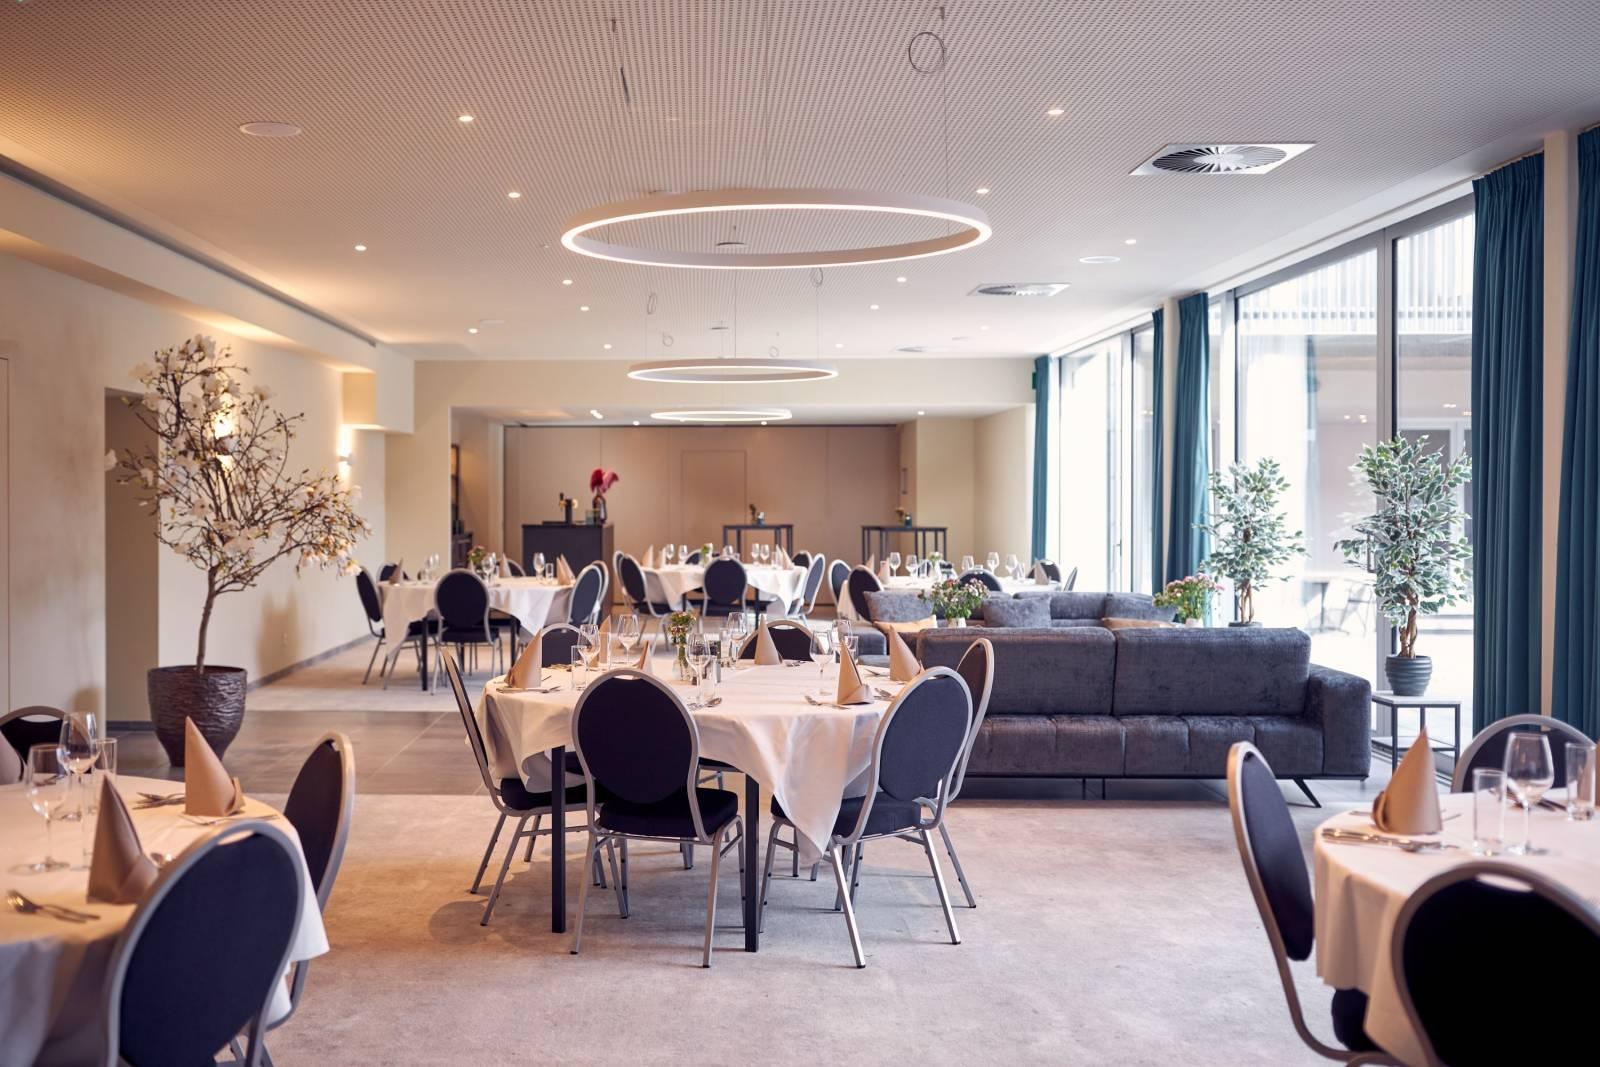 Feestal - Van der Valk hotel Mechelen - House of Weddings (1)